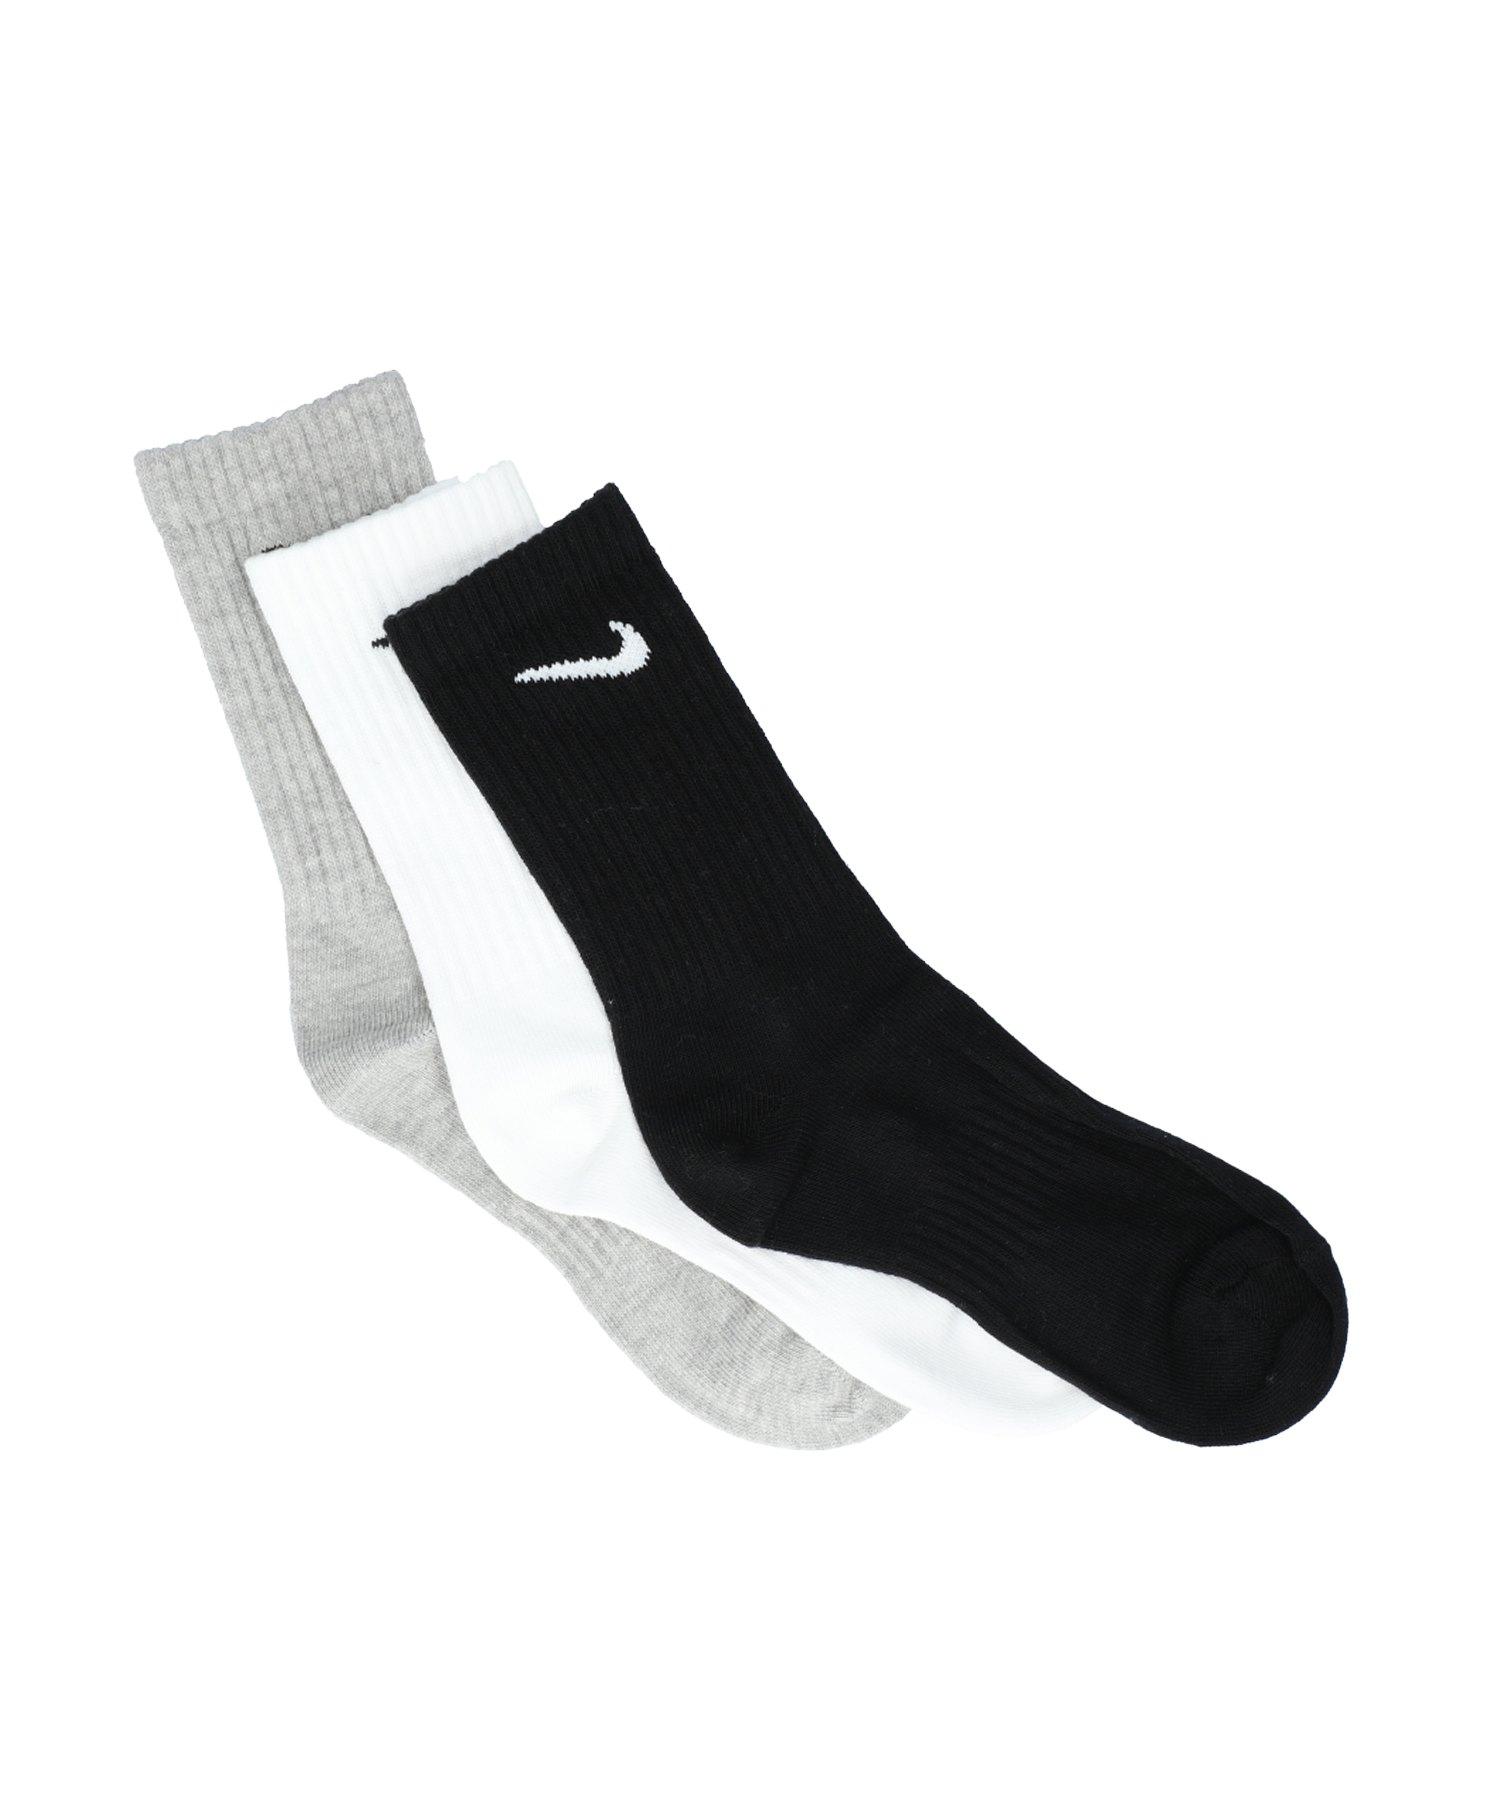 Nike Everyday Lightweight 3er Pack Socken F901 - grau